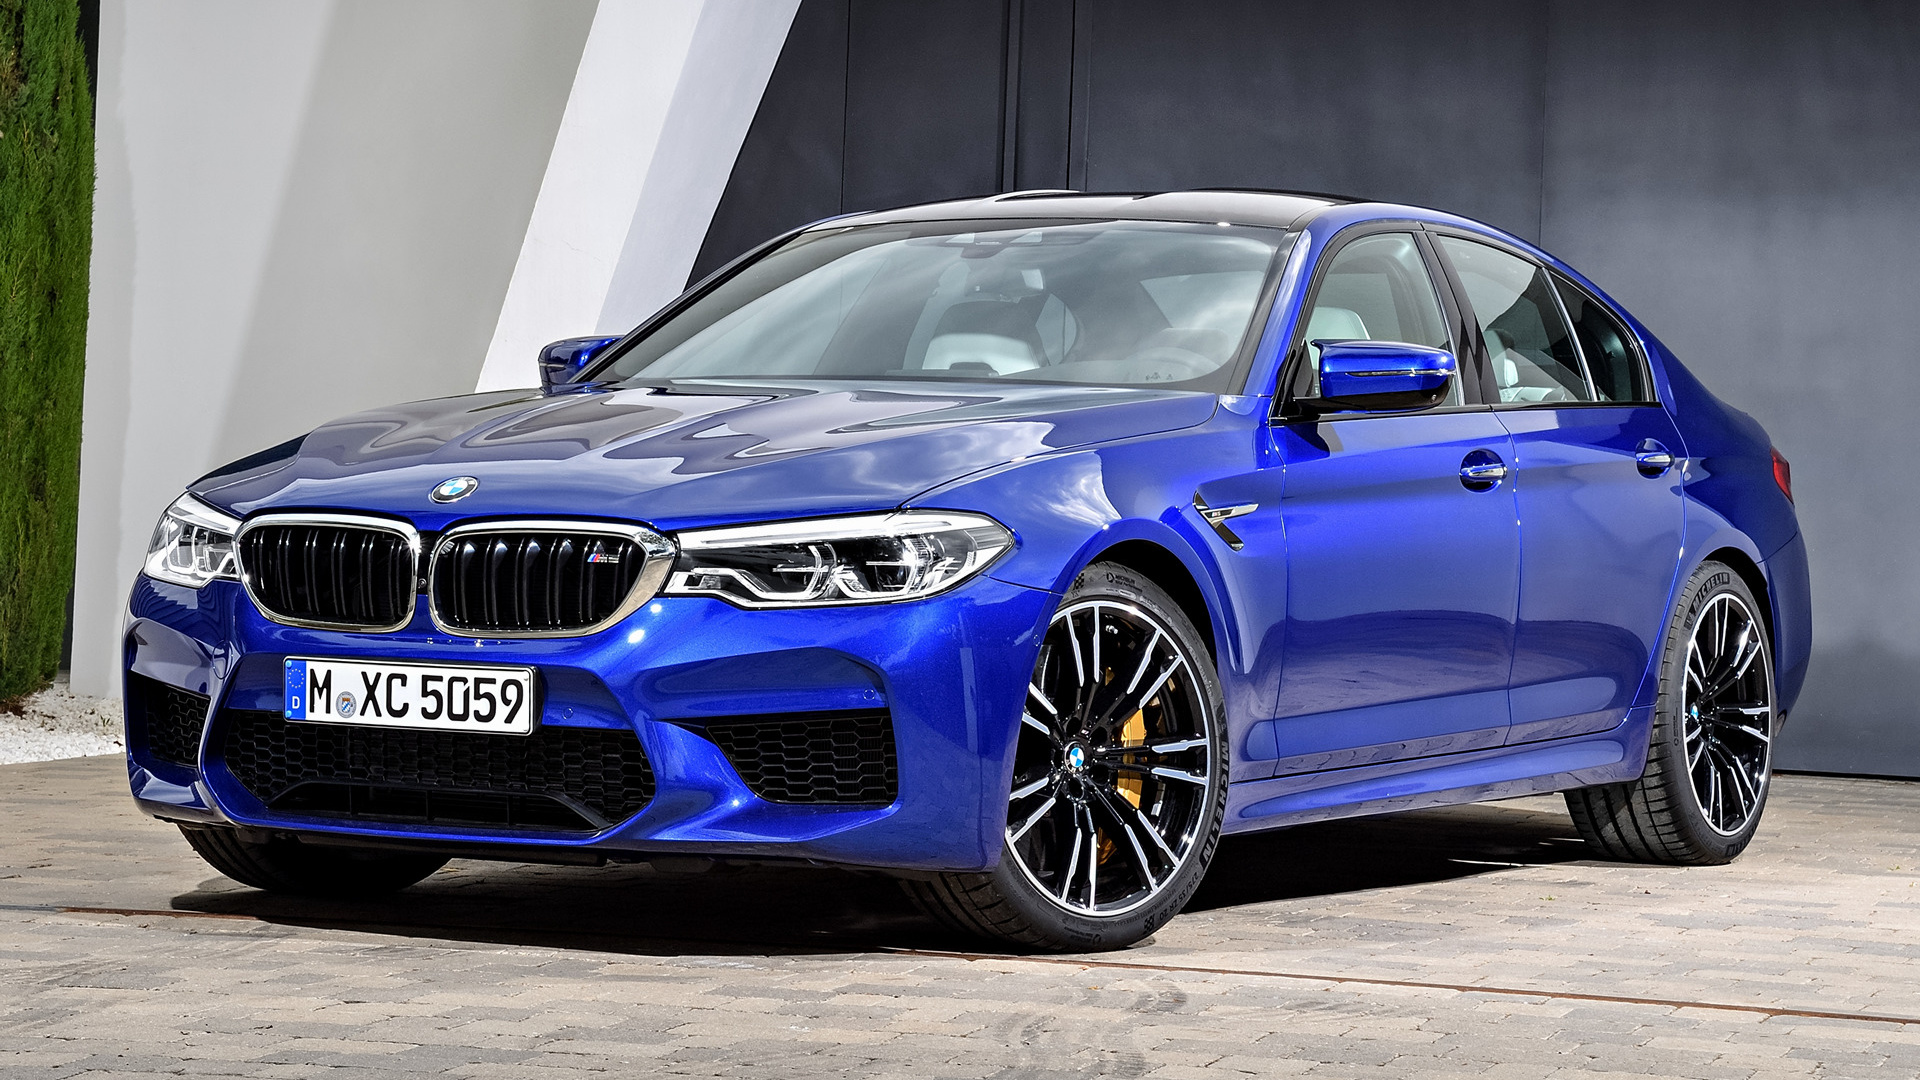 2018 BMW M5 HD Wallpaper Background Image 1920x1080 ID 1920x1080